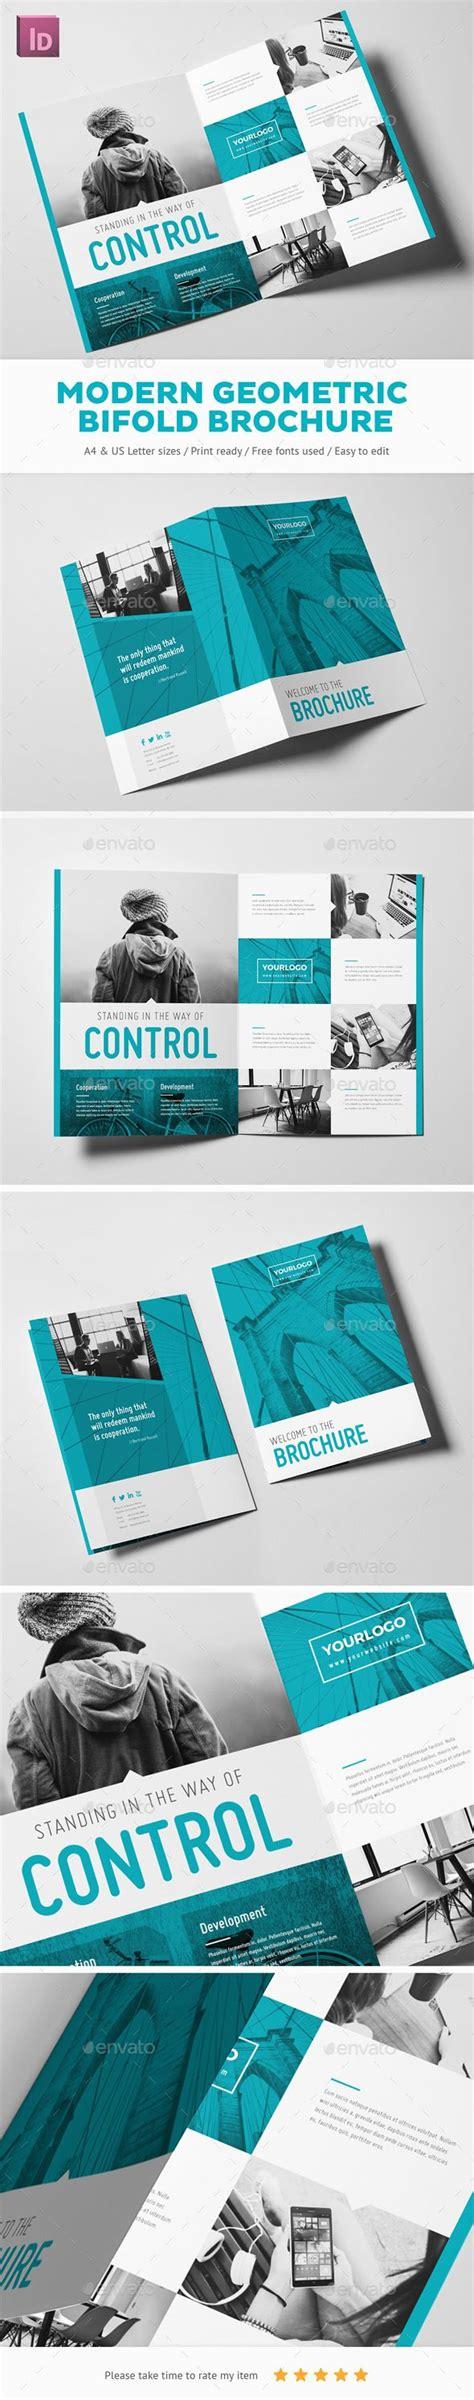 25 best ideas about brochure design on pinterest